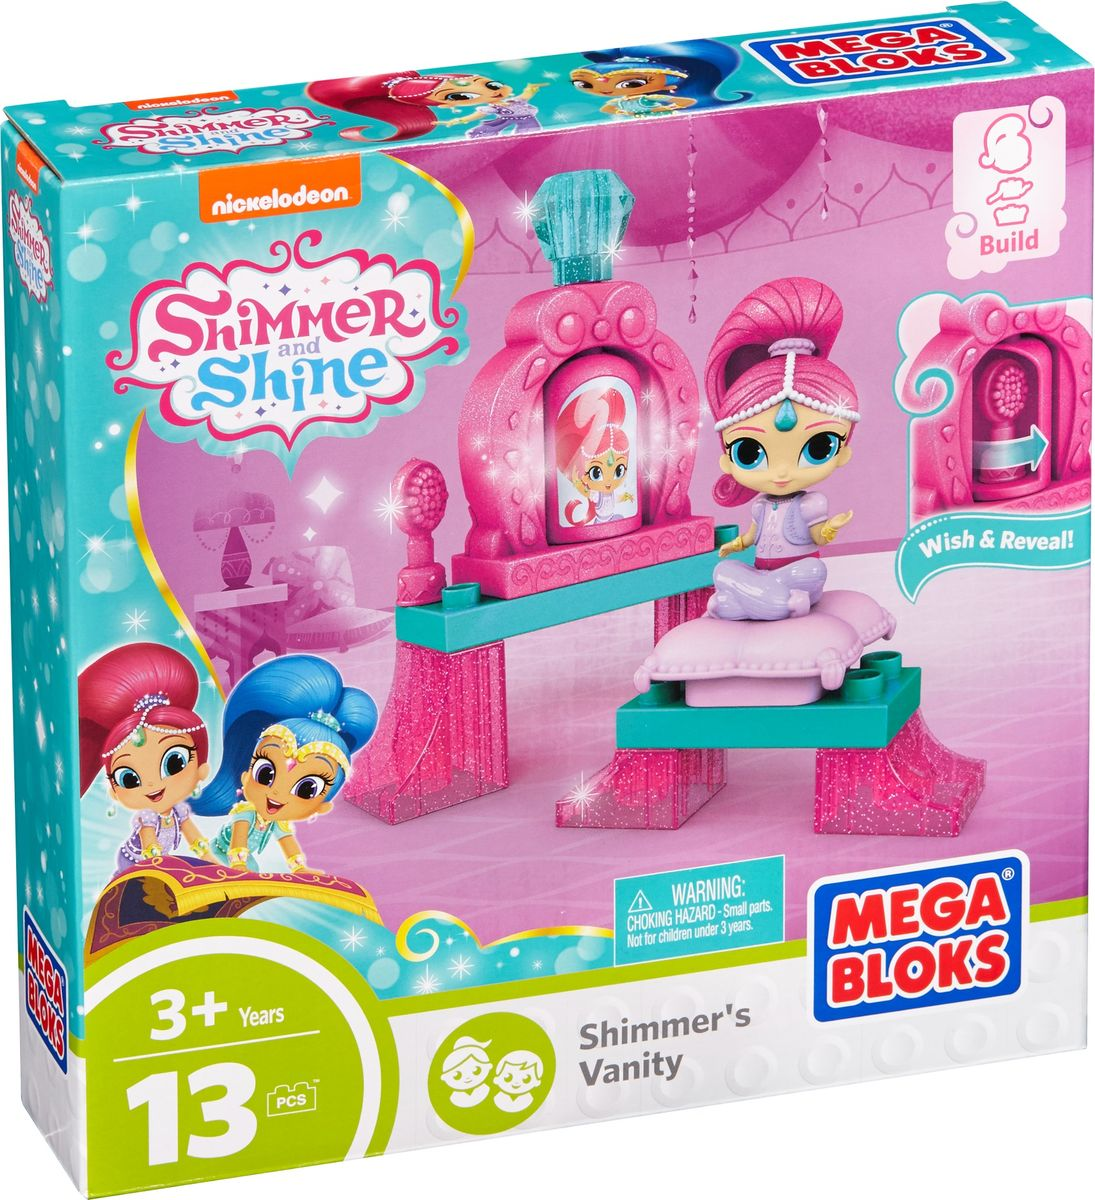 Mega Bloks Shimmer & Shine Конструктор Мечты маленьких джинников Shimmer's Vanity крючок двойной tatkraft mega lock на вакуумном шурупе